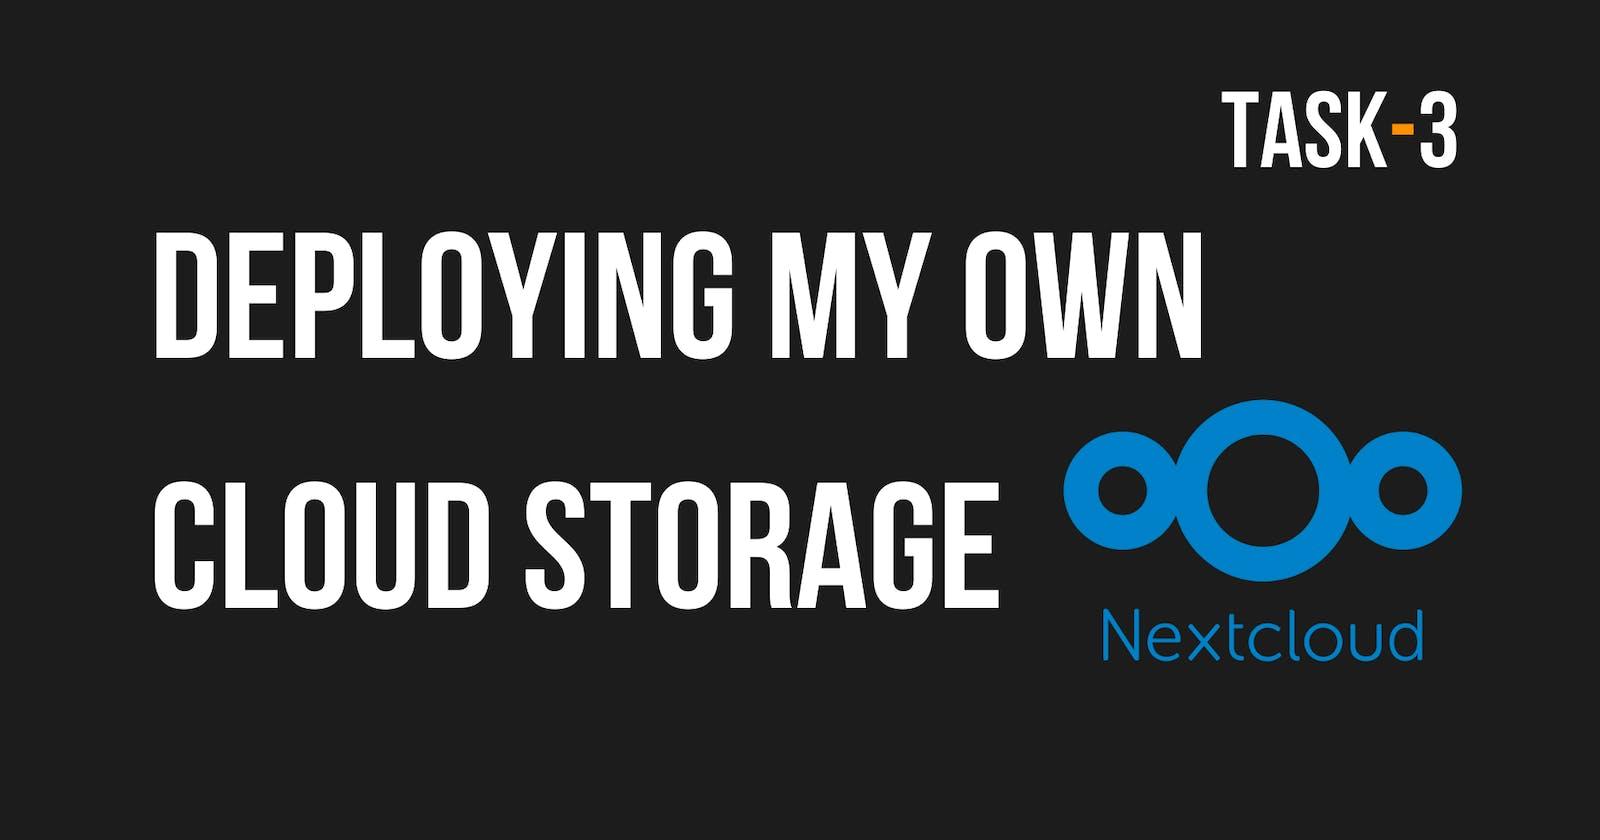 Deploying My Own Cloud | Task - 3